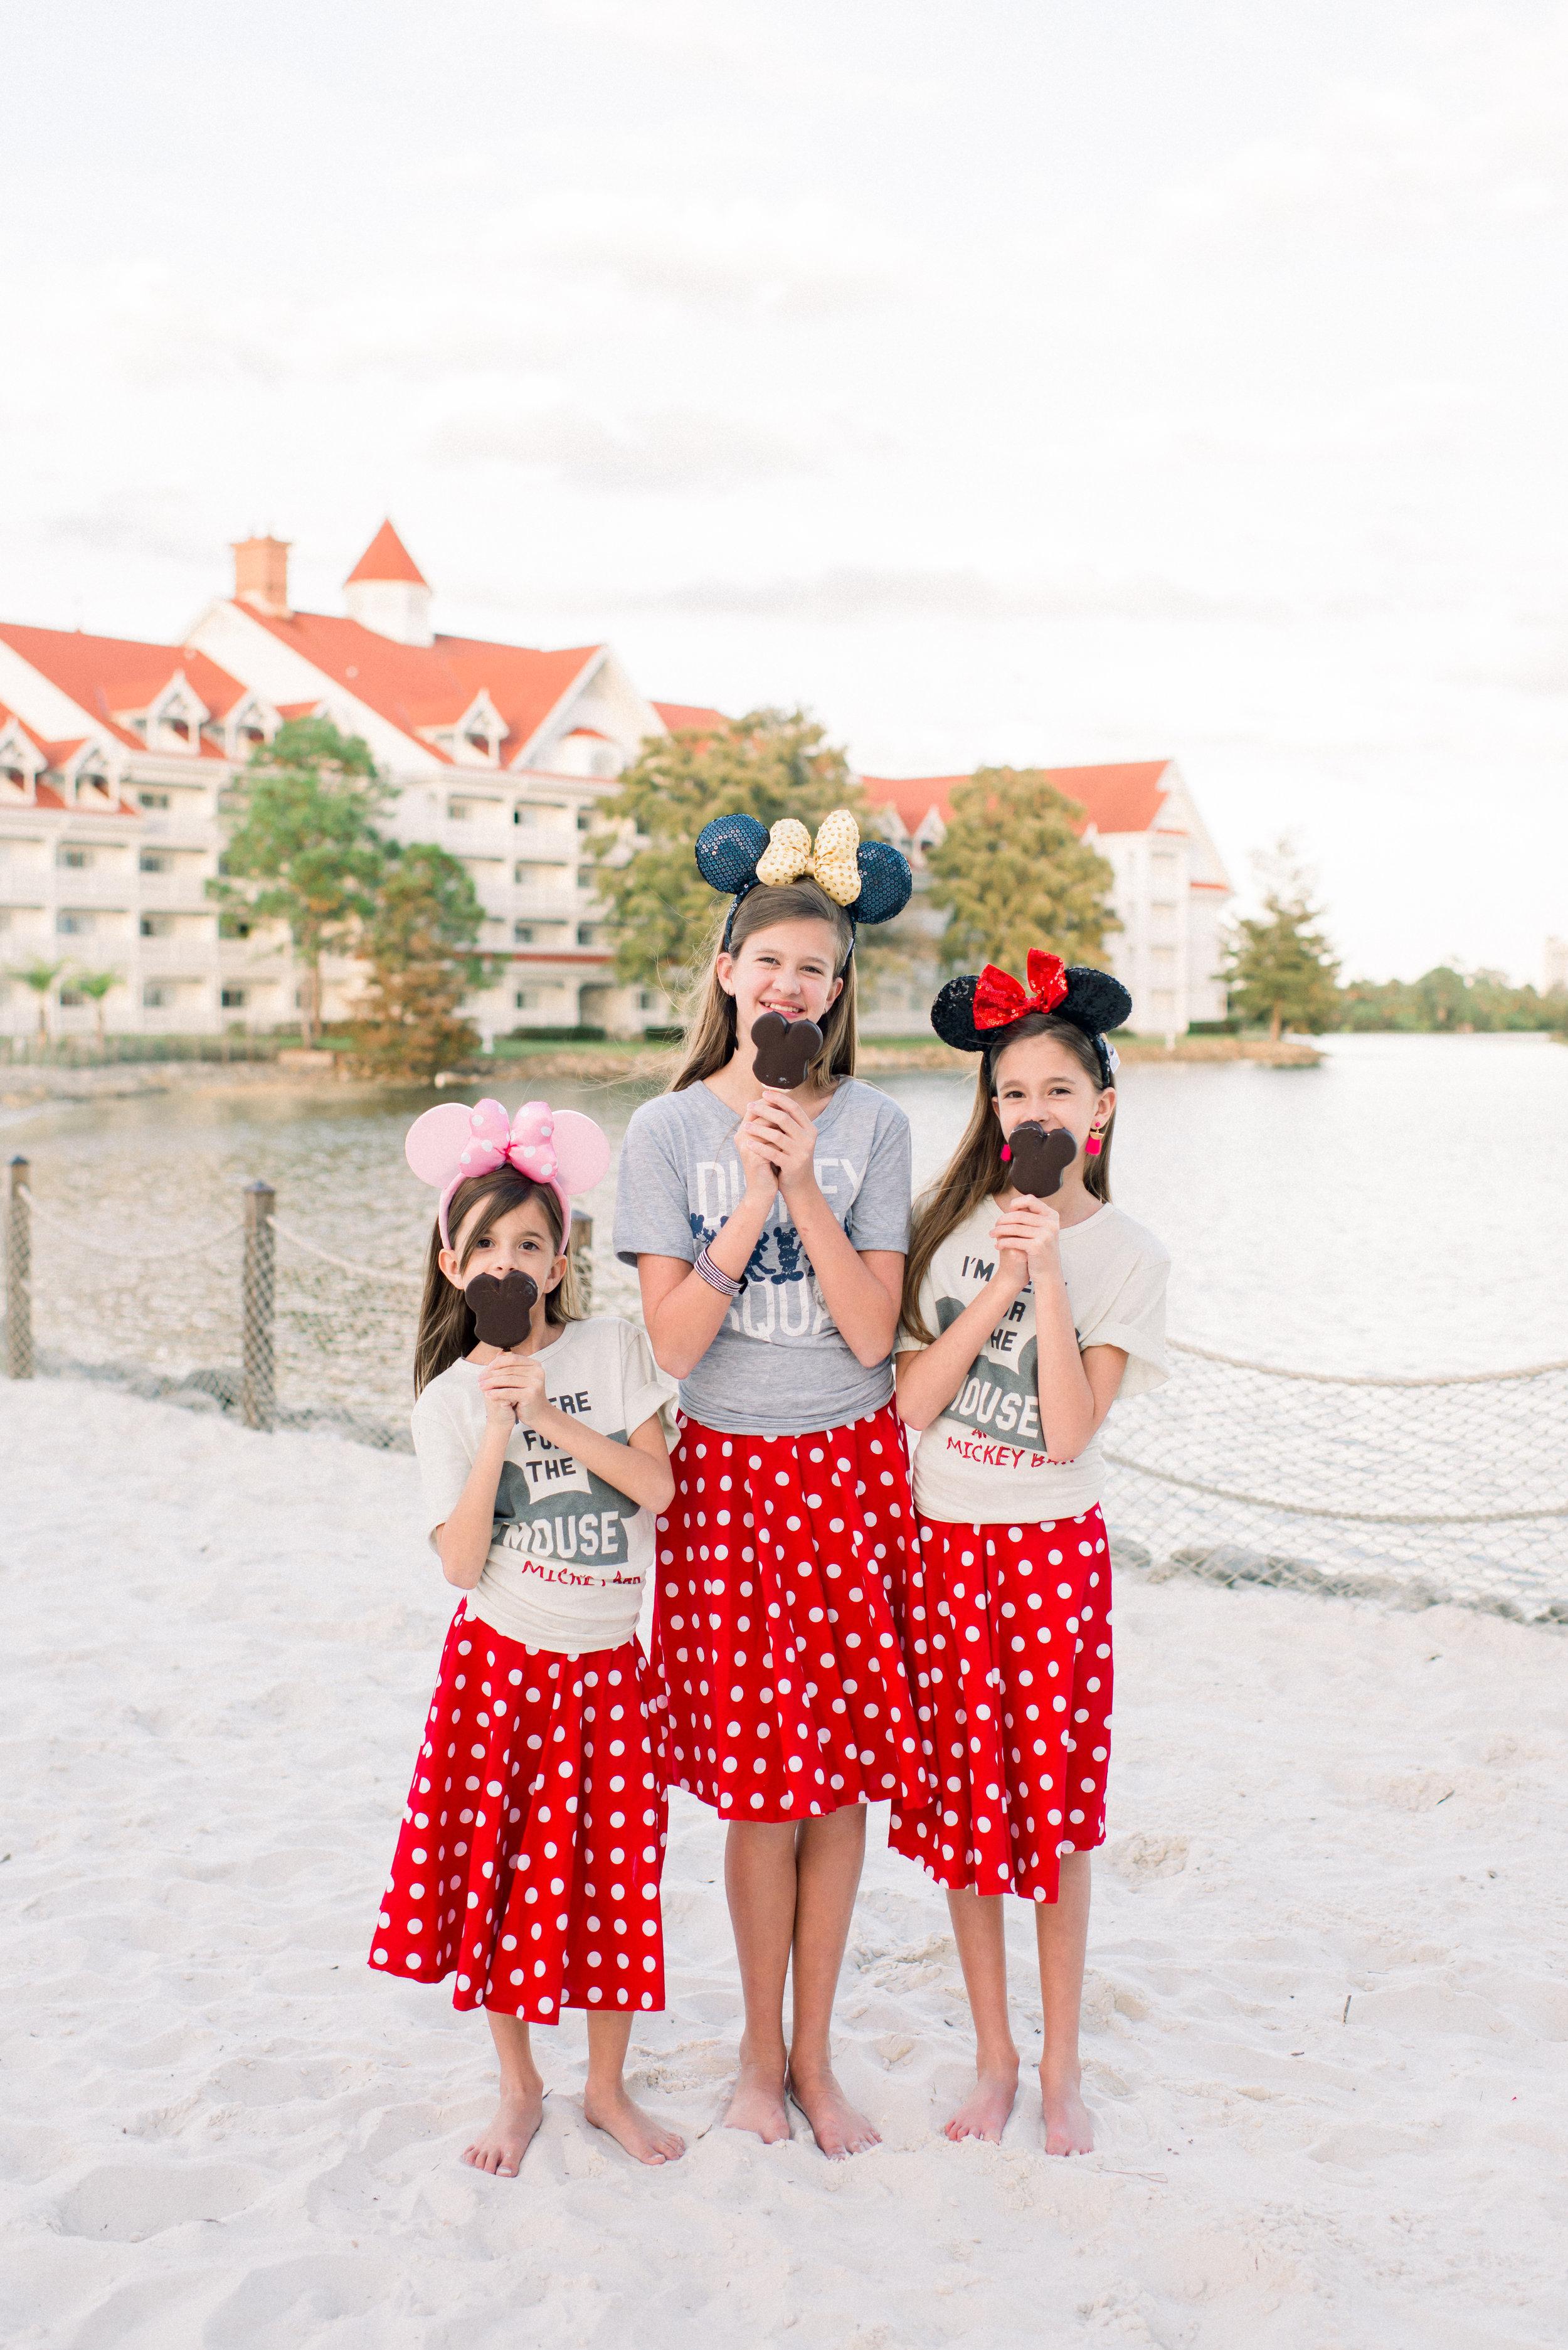 KateTaramykinStudios-Disney-Grand-Floridian-Family-Portraits-Kulwicki-15.jpg